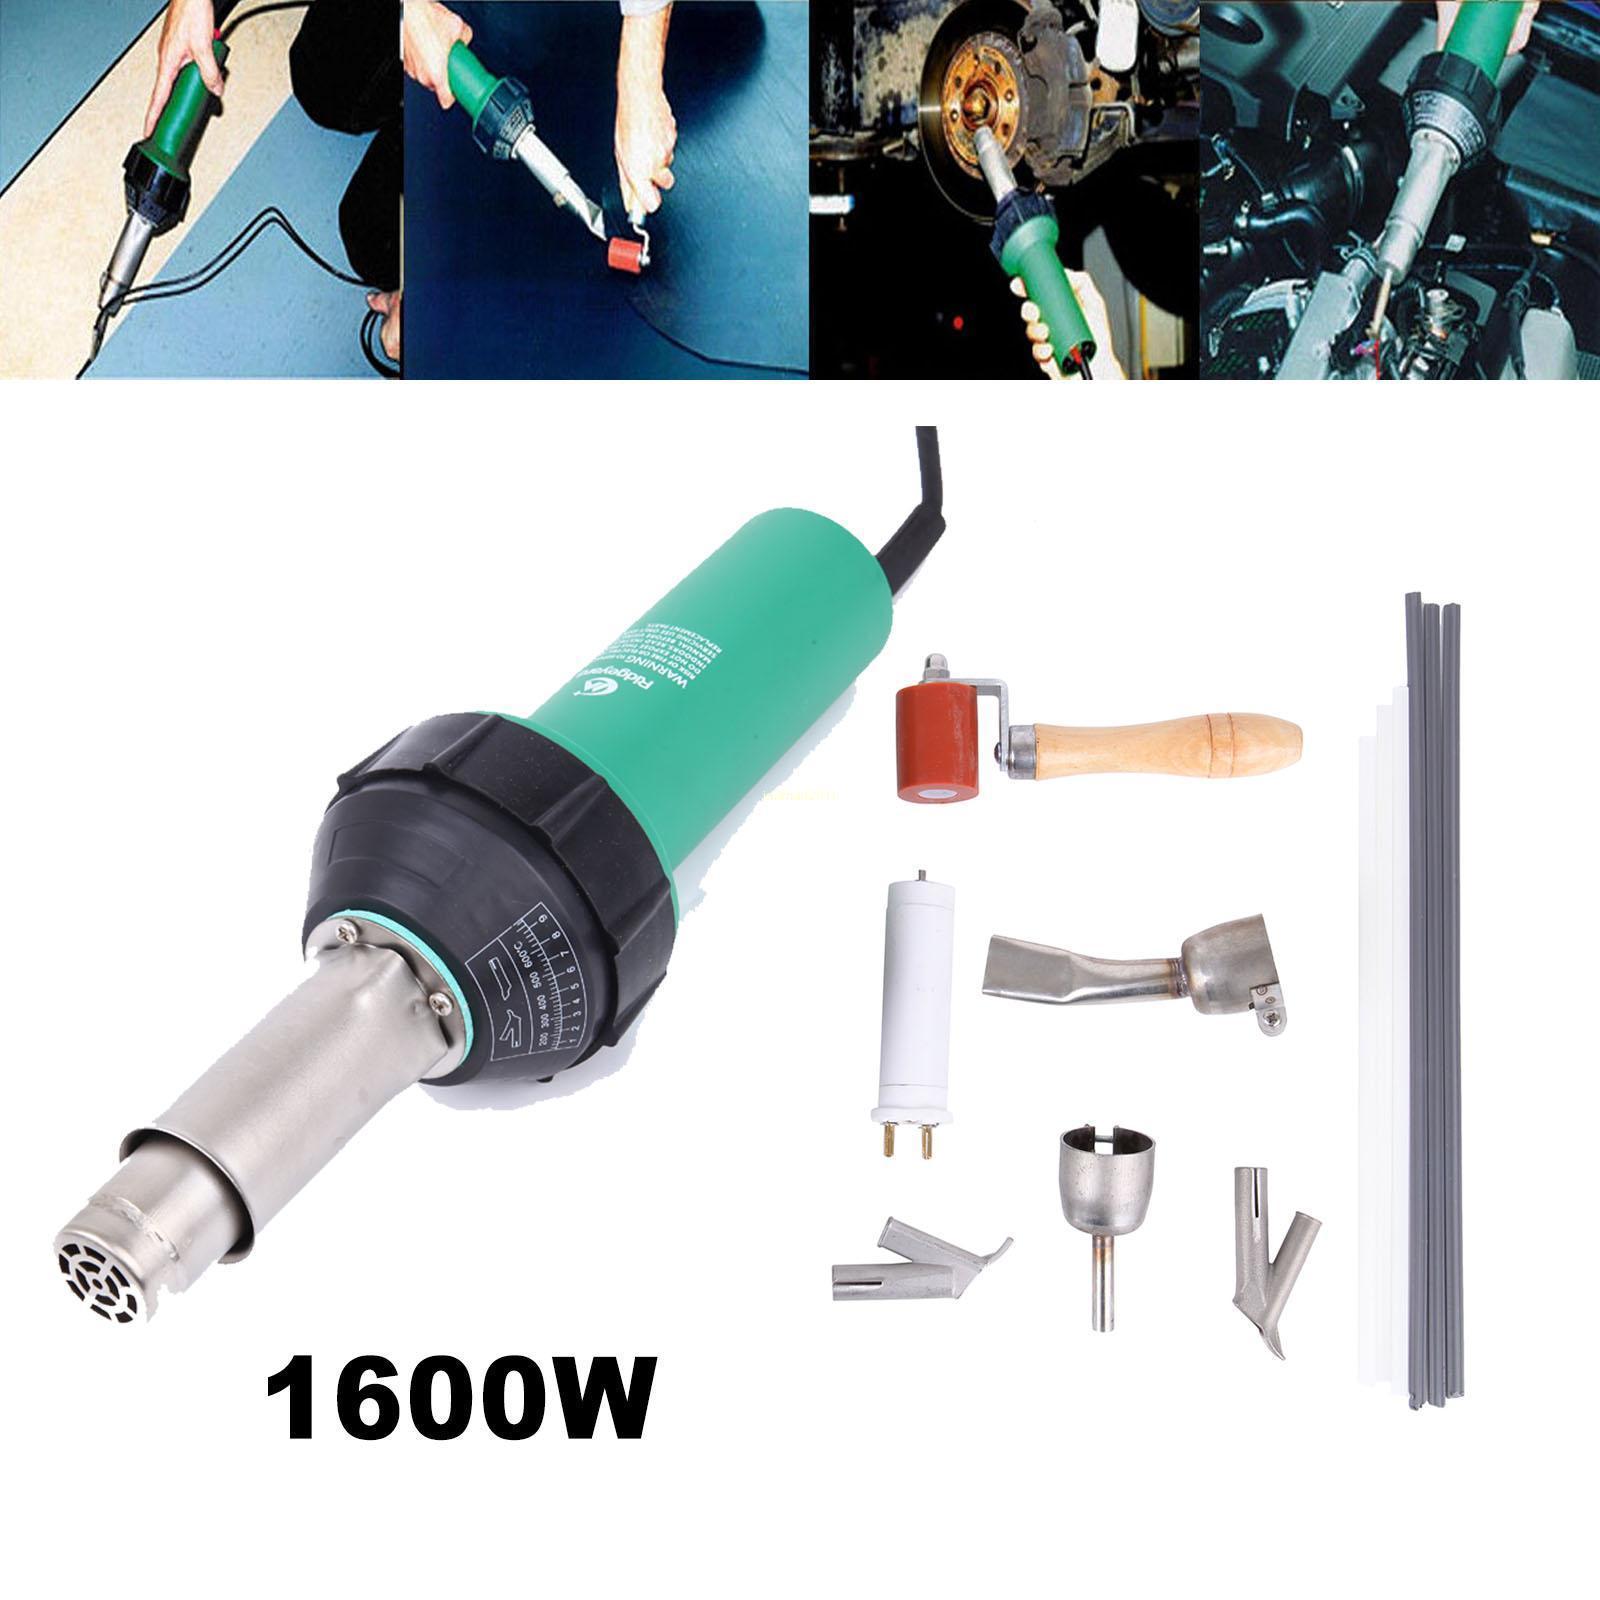 Yonntech 1500 واط 1600 واط الهواء الساخن الشعلة البلاستيك لحام بندقية لحام مسدس مجموعة أدوات إصلاح البلاستيك مع فوهات الأسطوانة